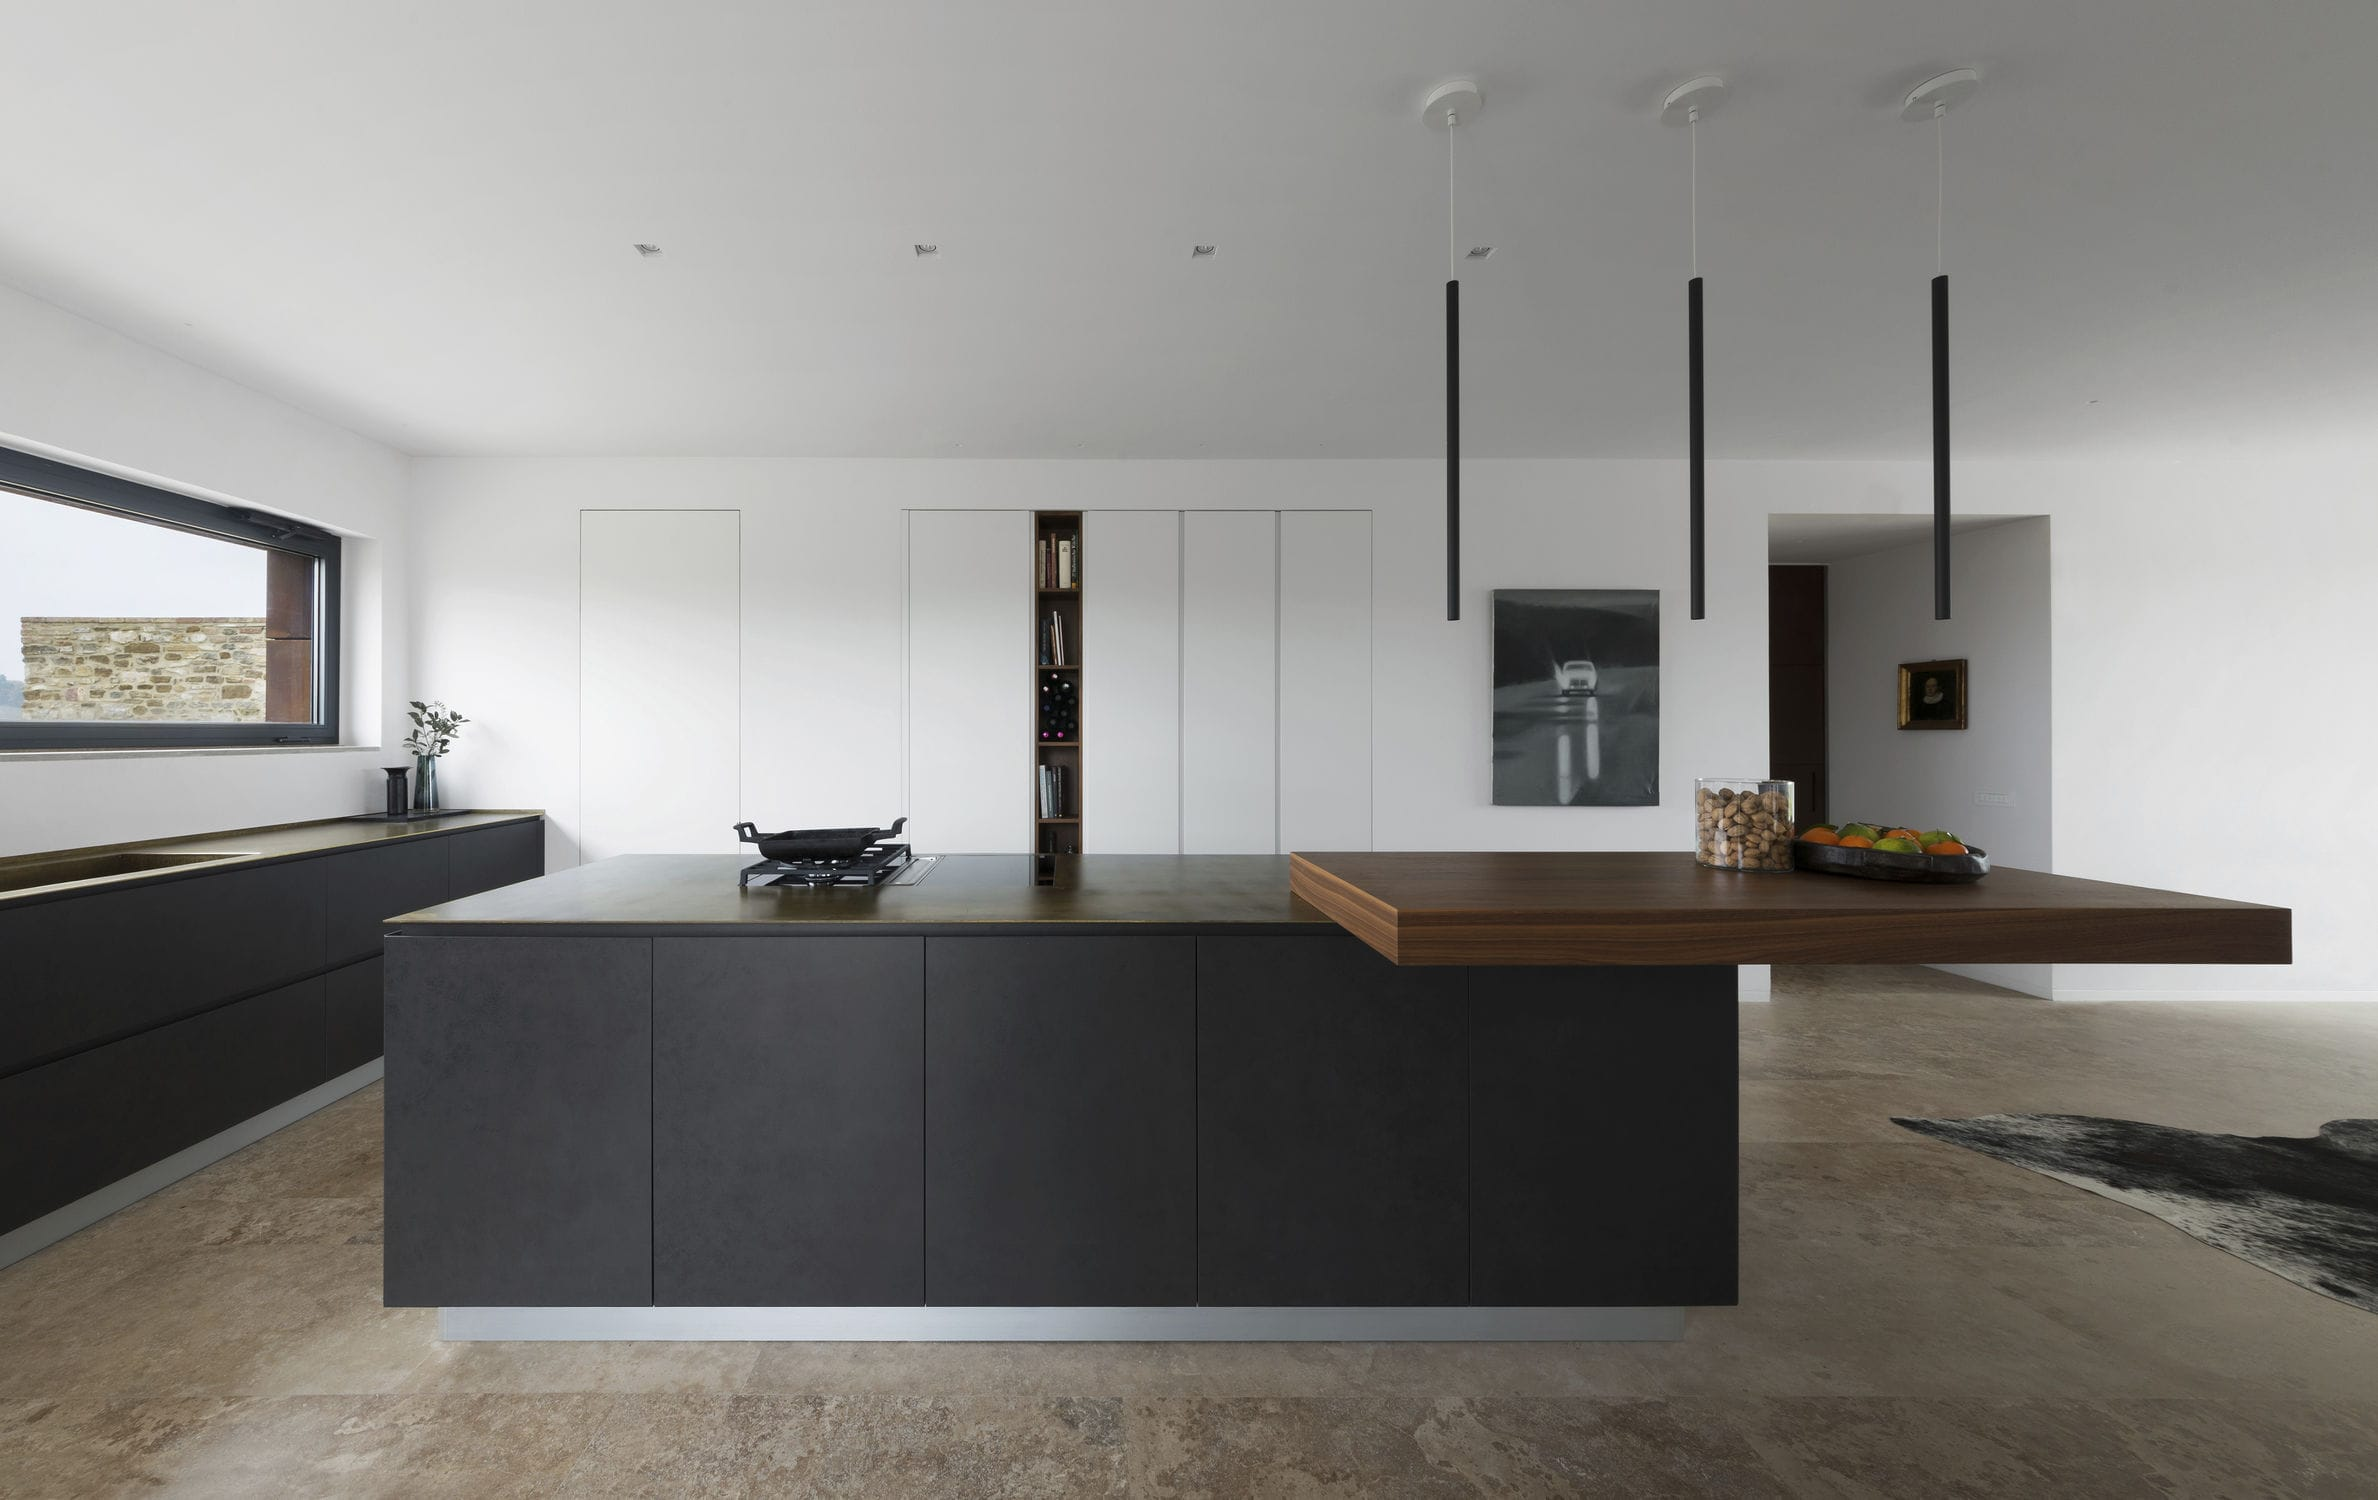 Moderne Küche / Holz / Kochinsel / ohne Griff - 201605 ...